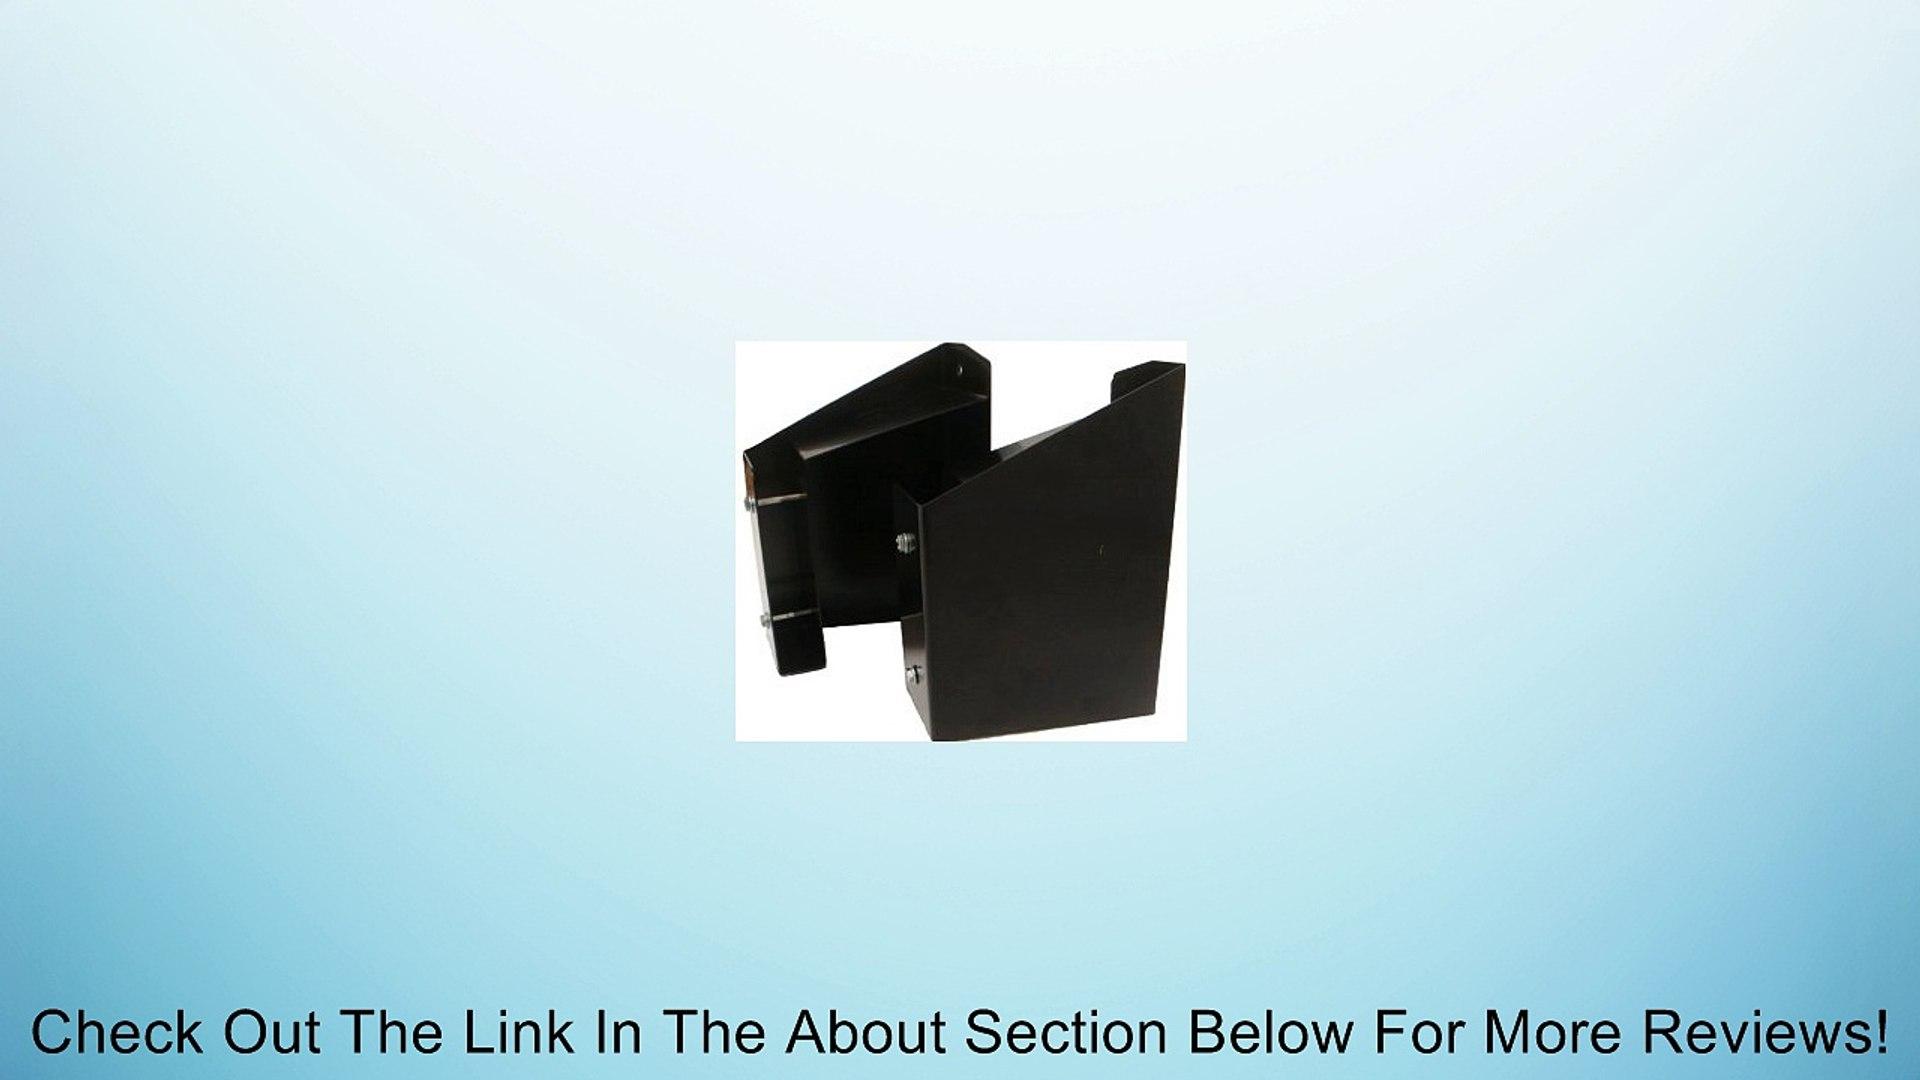 Lightweight Outboard Motor Wall Storage Bracket for Storing Multiple Motors